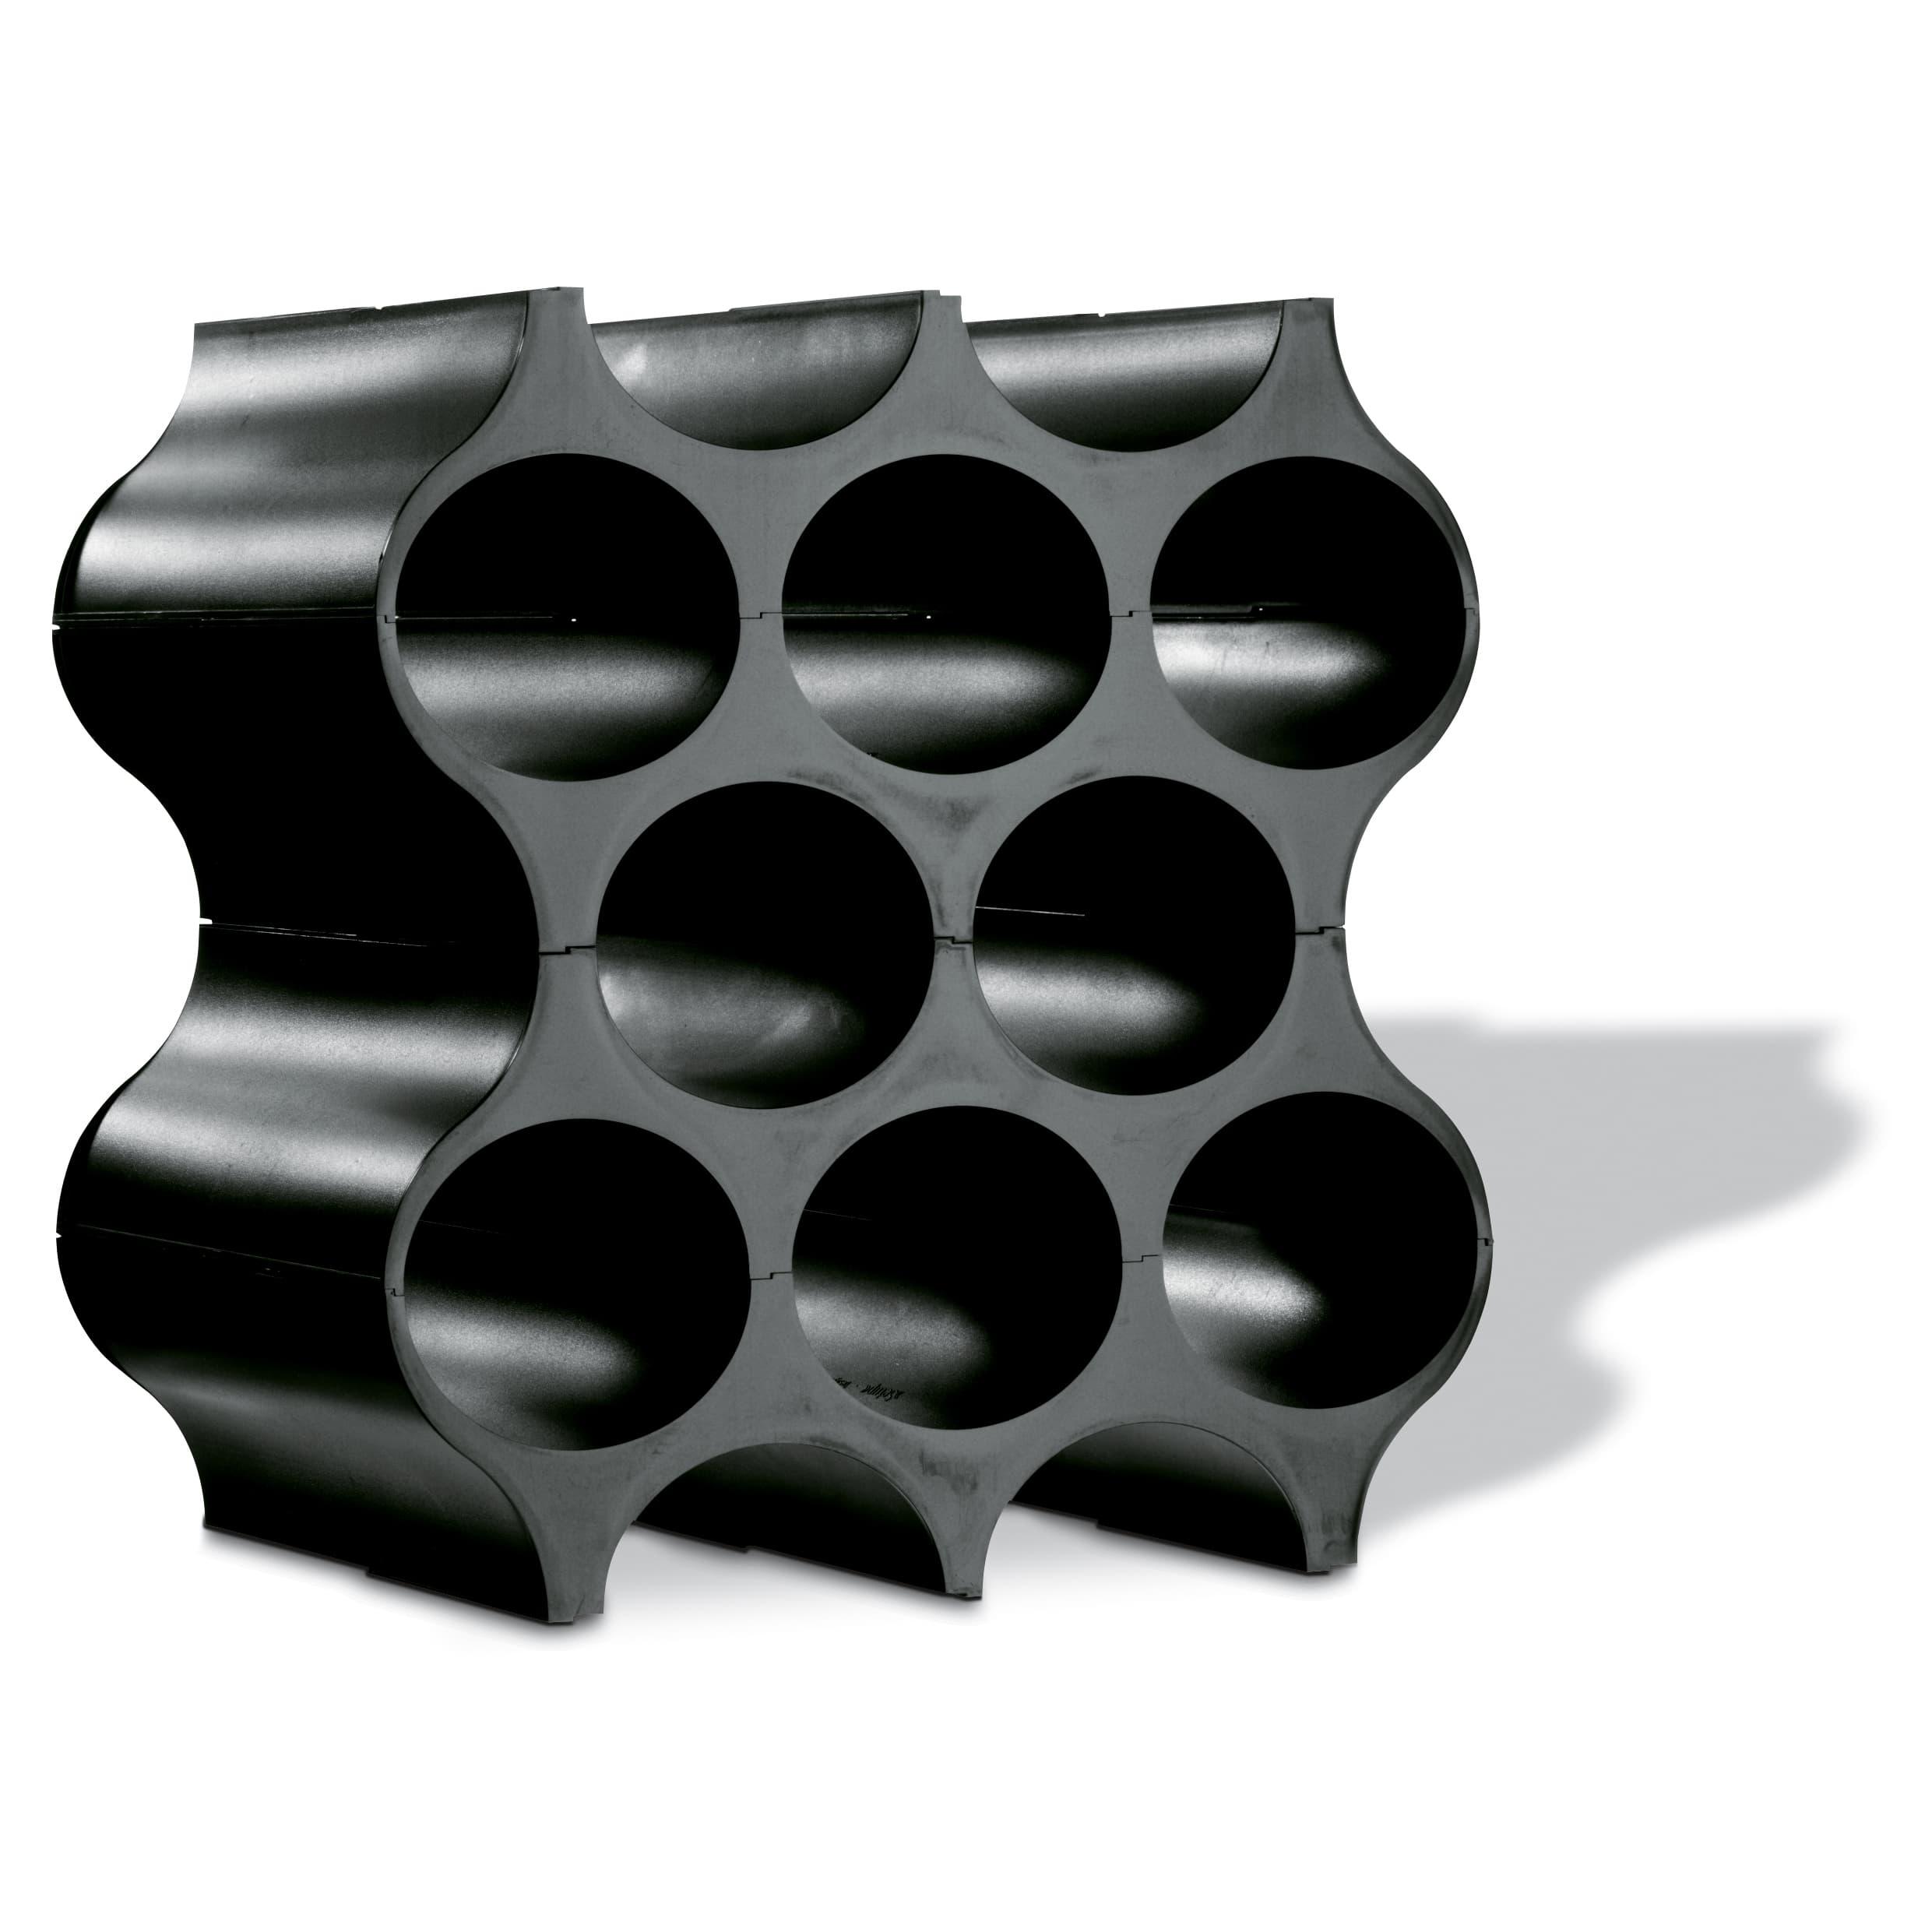 Suport din termoplastic pentru 10 sticle Set-Up Cosmos Negru, l23xA35,3xH36,4 cm poza